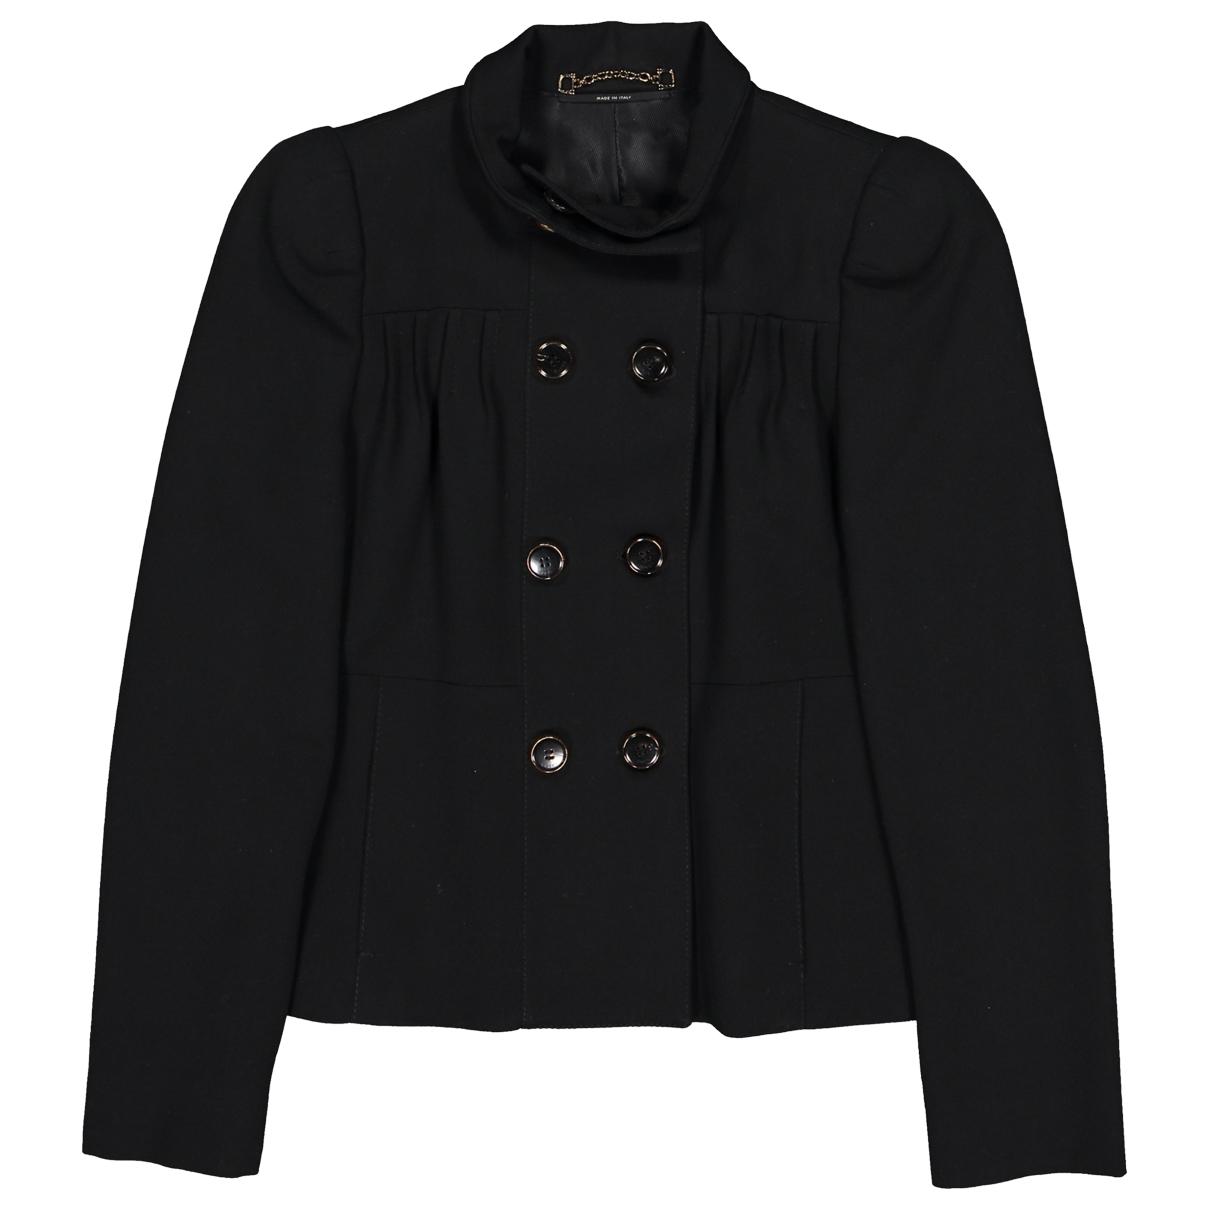 Gucci \N Jacke in  Schwarz Wolle